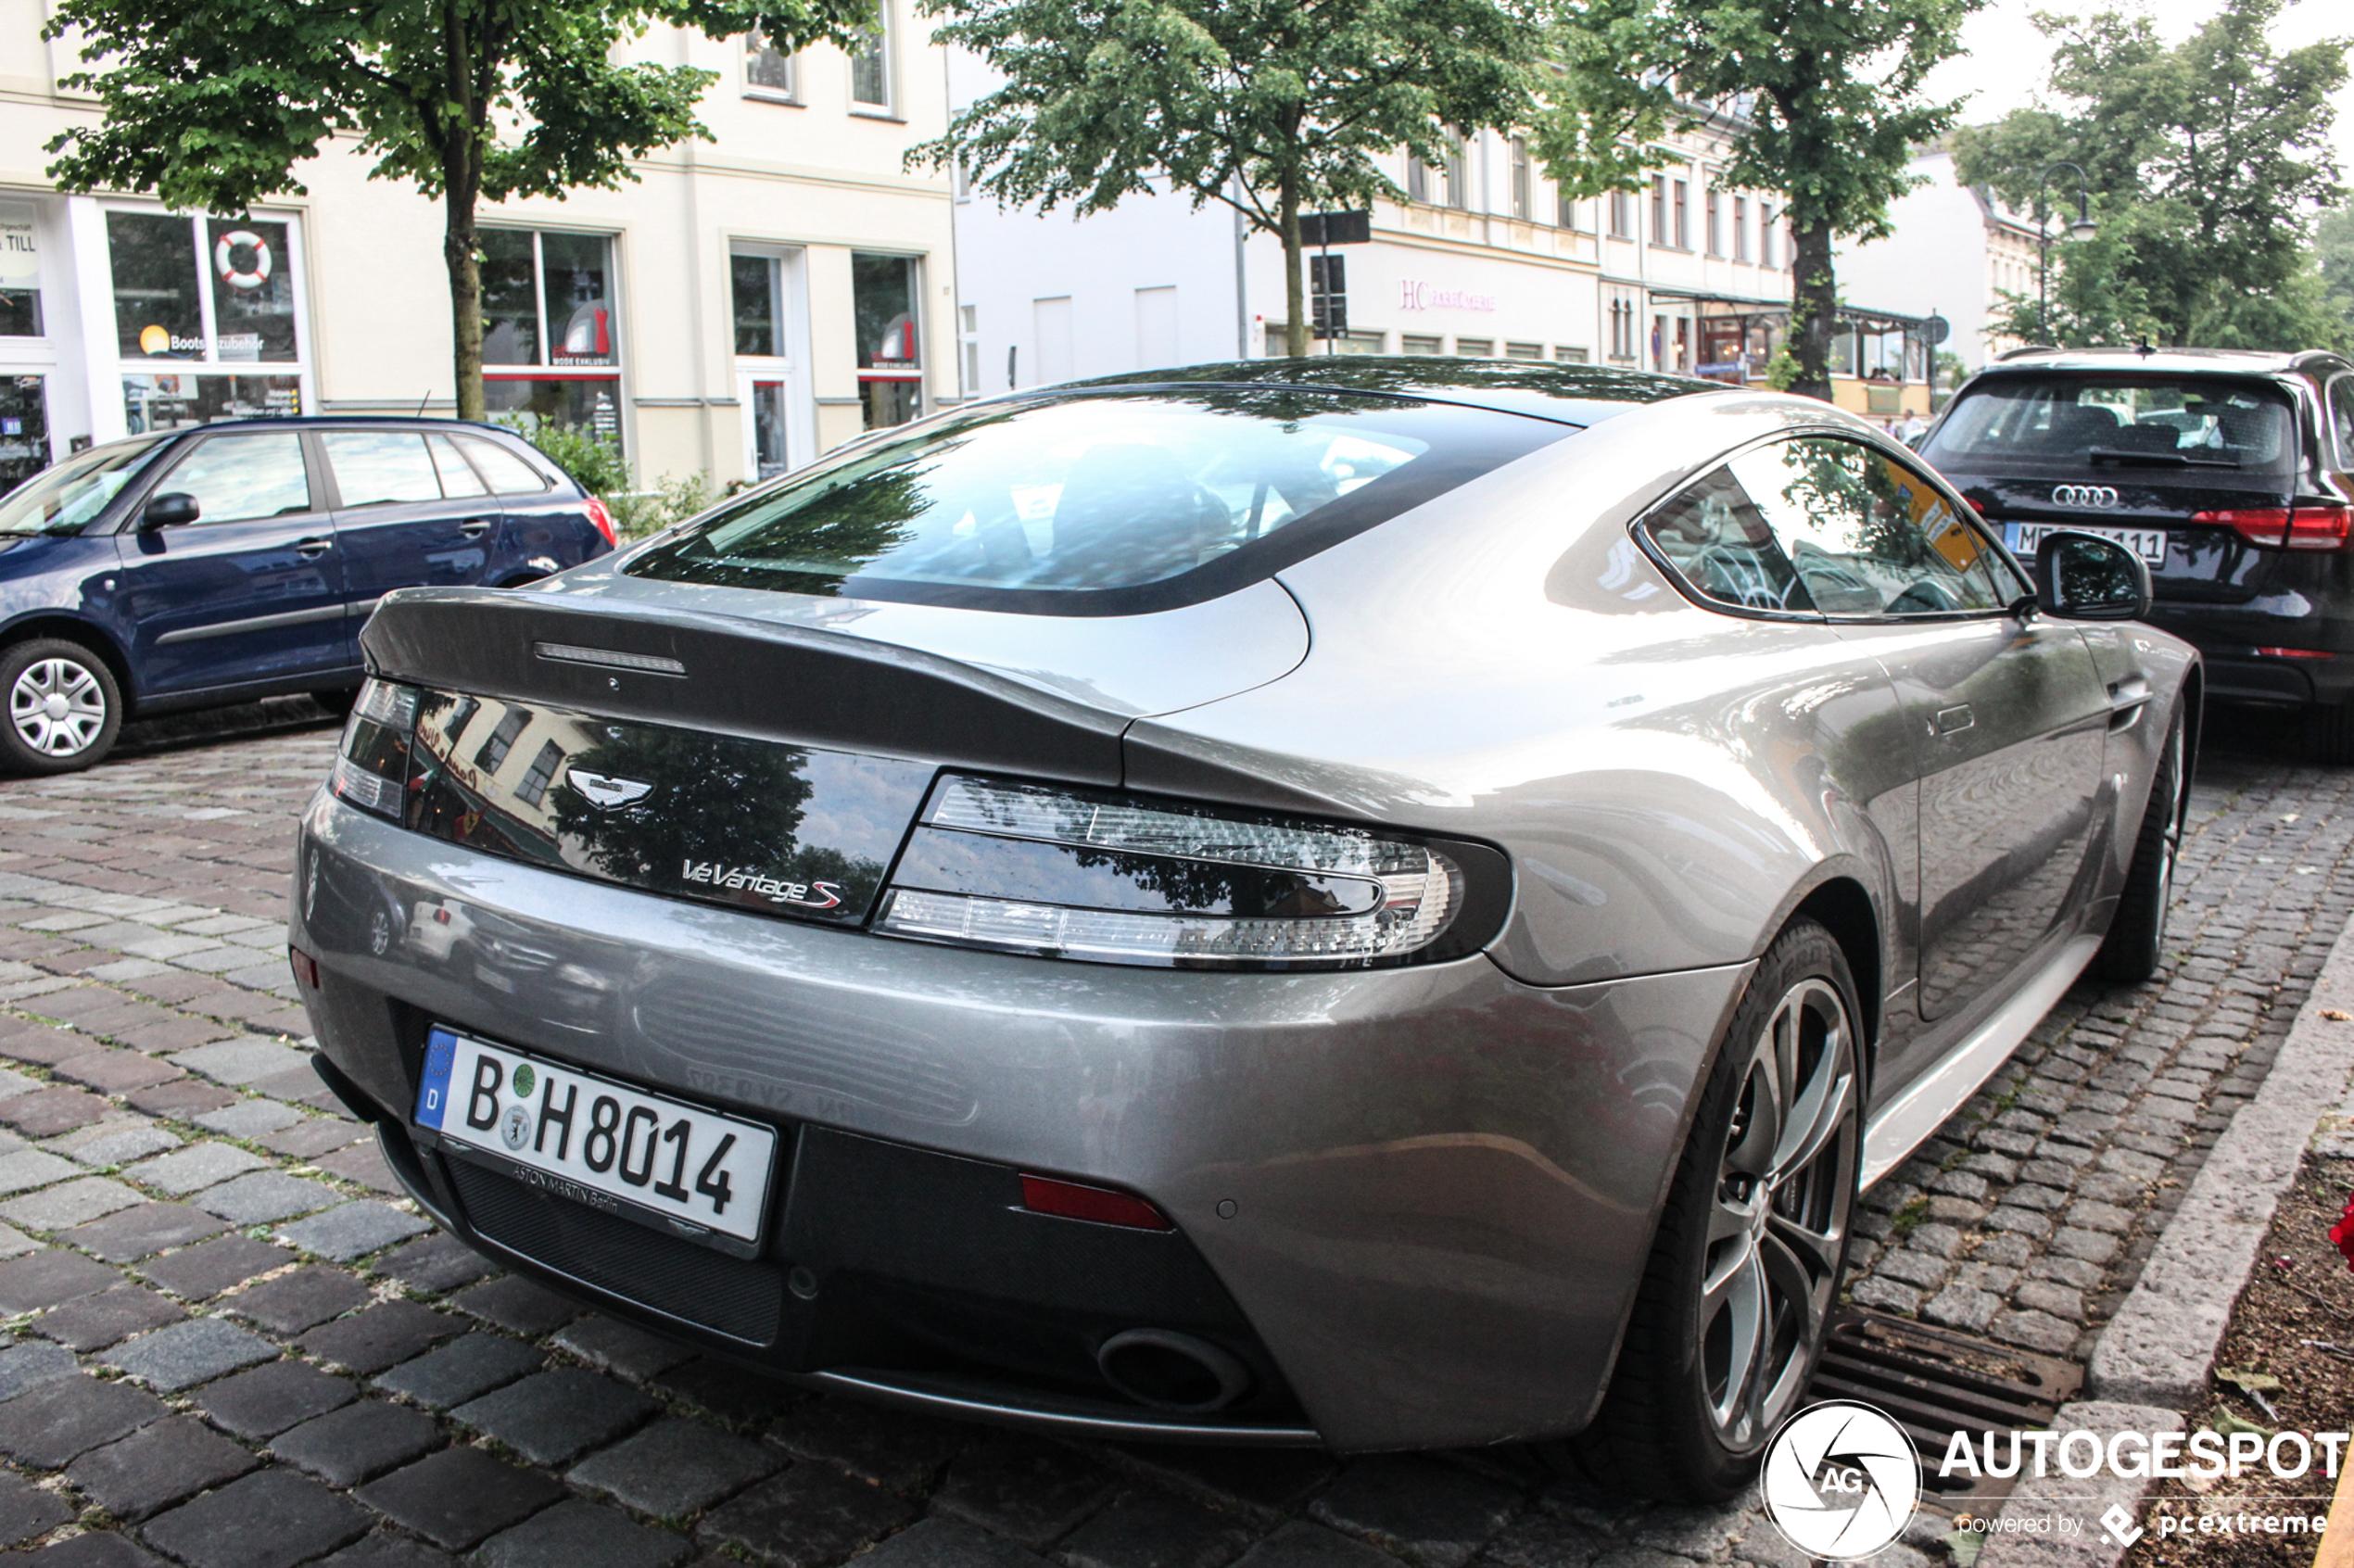 Aston Martin V12 Vantage S 3 April 2020 Autogespot